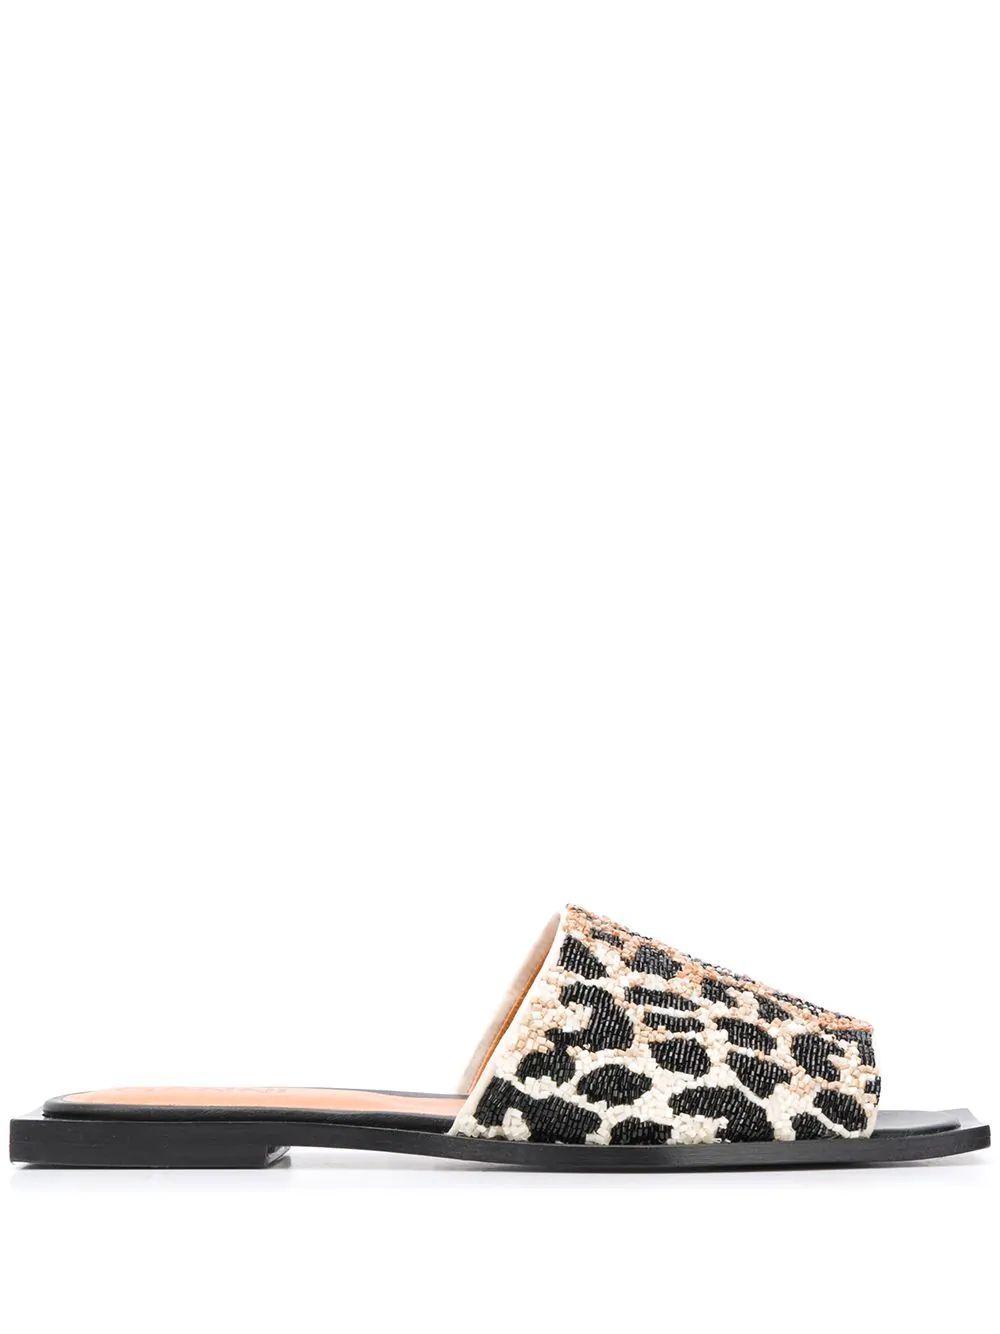 Leopard square Toe Slide Sandal